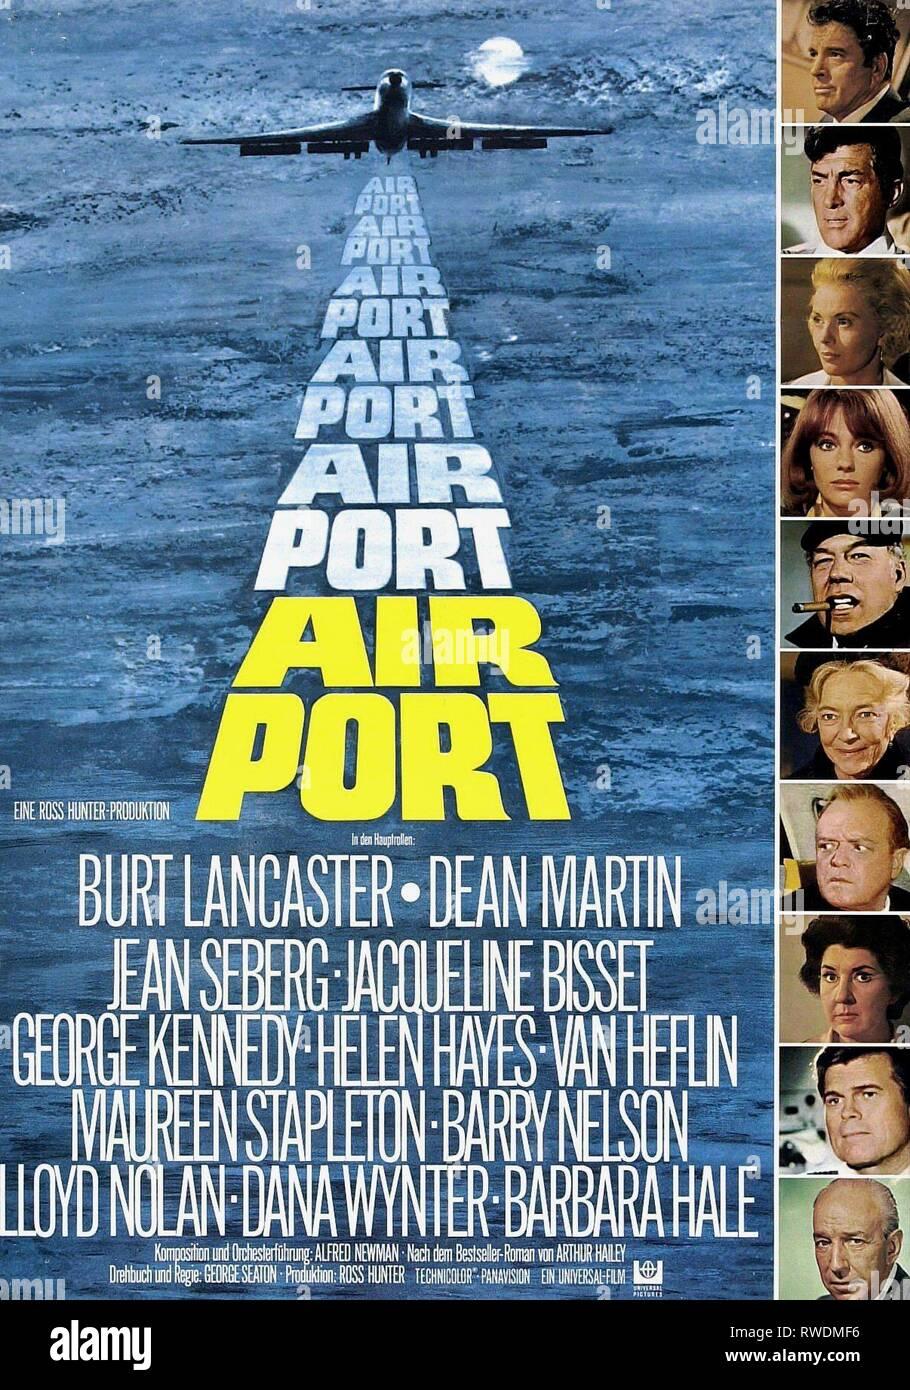 BURT LANCASTER, DEAN MARTIN, JEAN SEBERG, JACQUELINE BISSET, GEORGE KENNEDY, HELEN HAYES, VAN HEFLIN, MAUREEN STAPLETON, BARRY NELSON,LLOYD NOLAN FILM POSTER - Stock Image